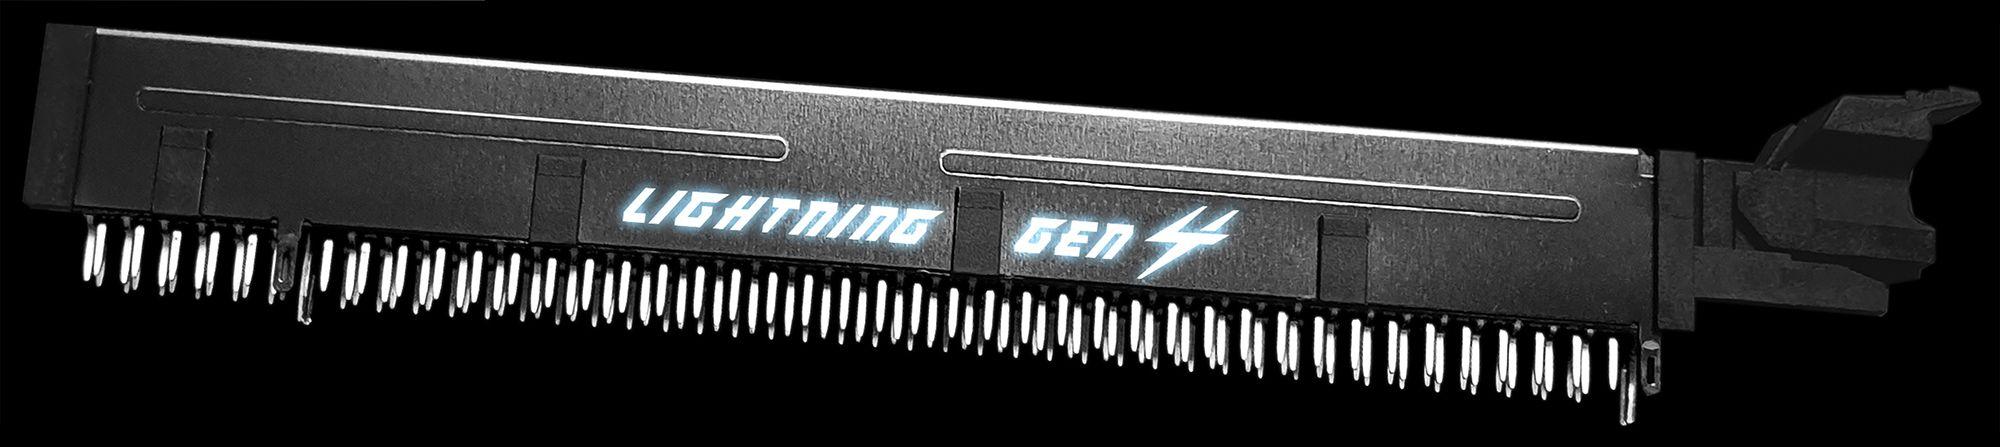 MSI X570 LIGHTNING GEN 4 PCI-E